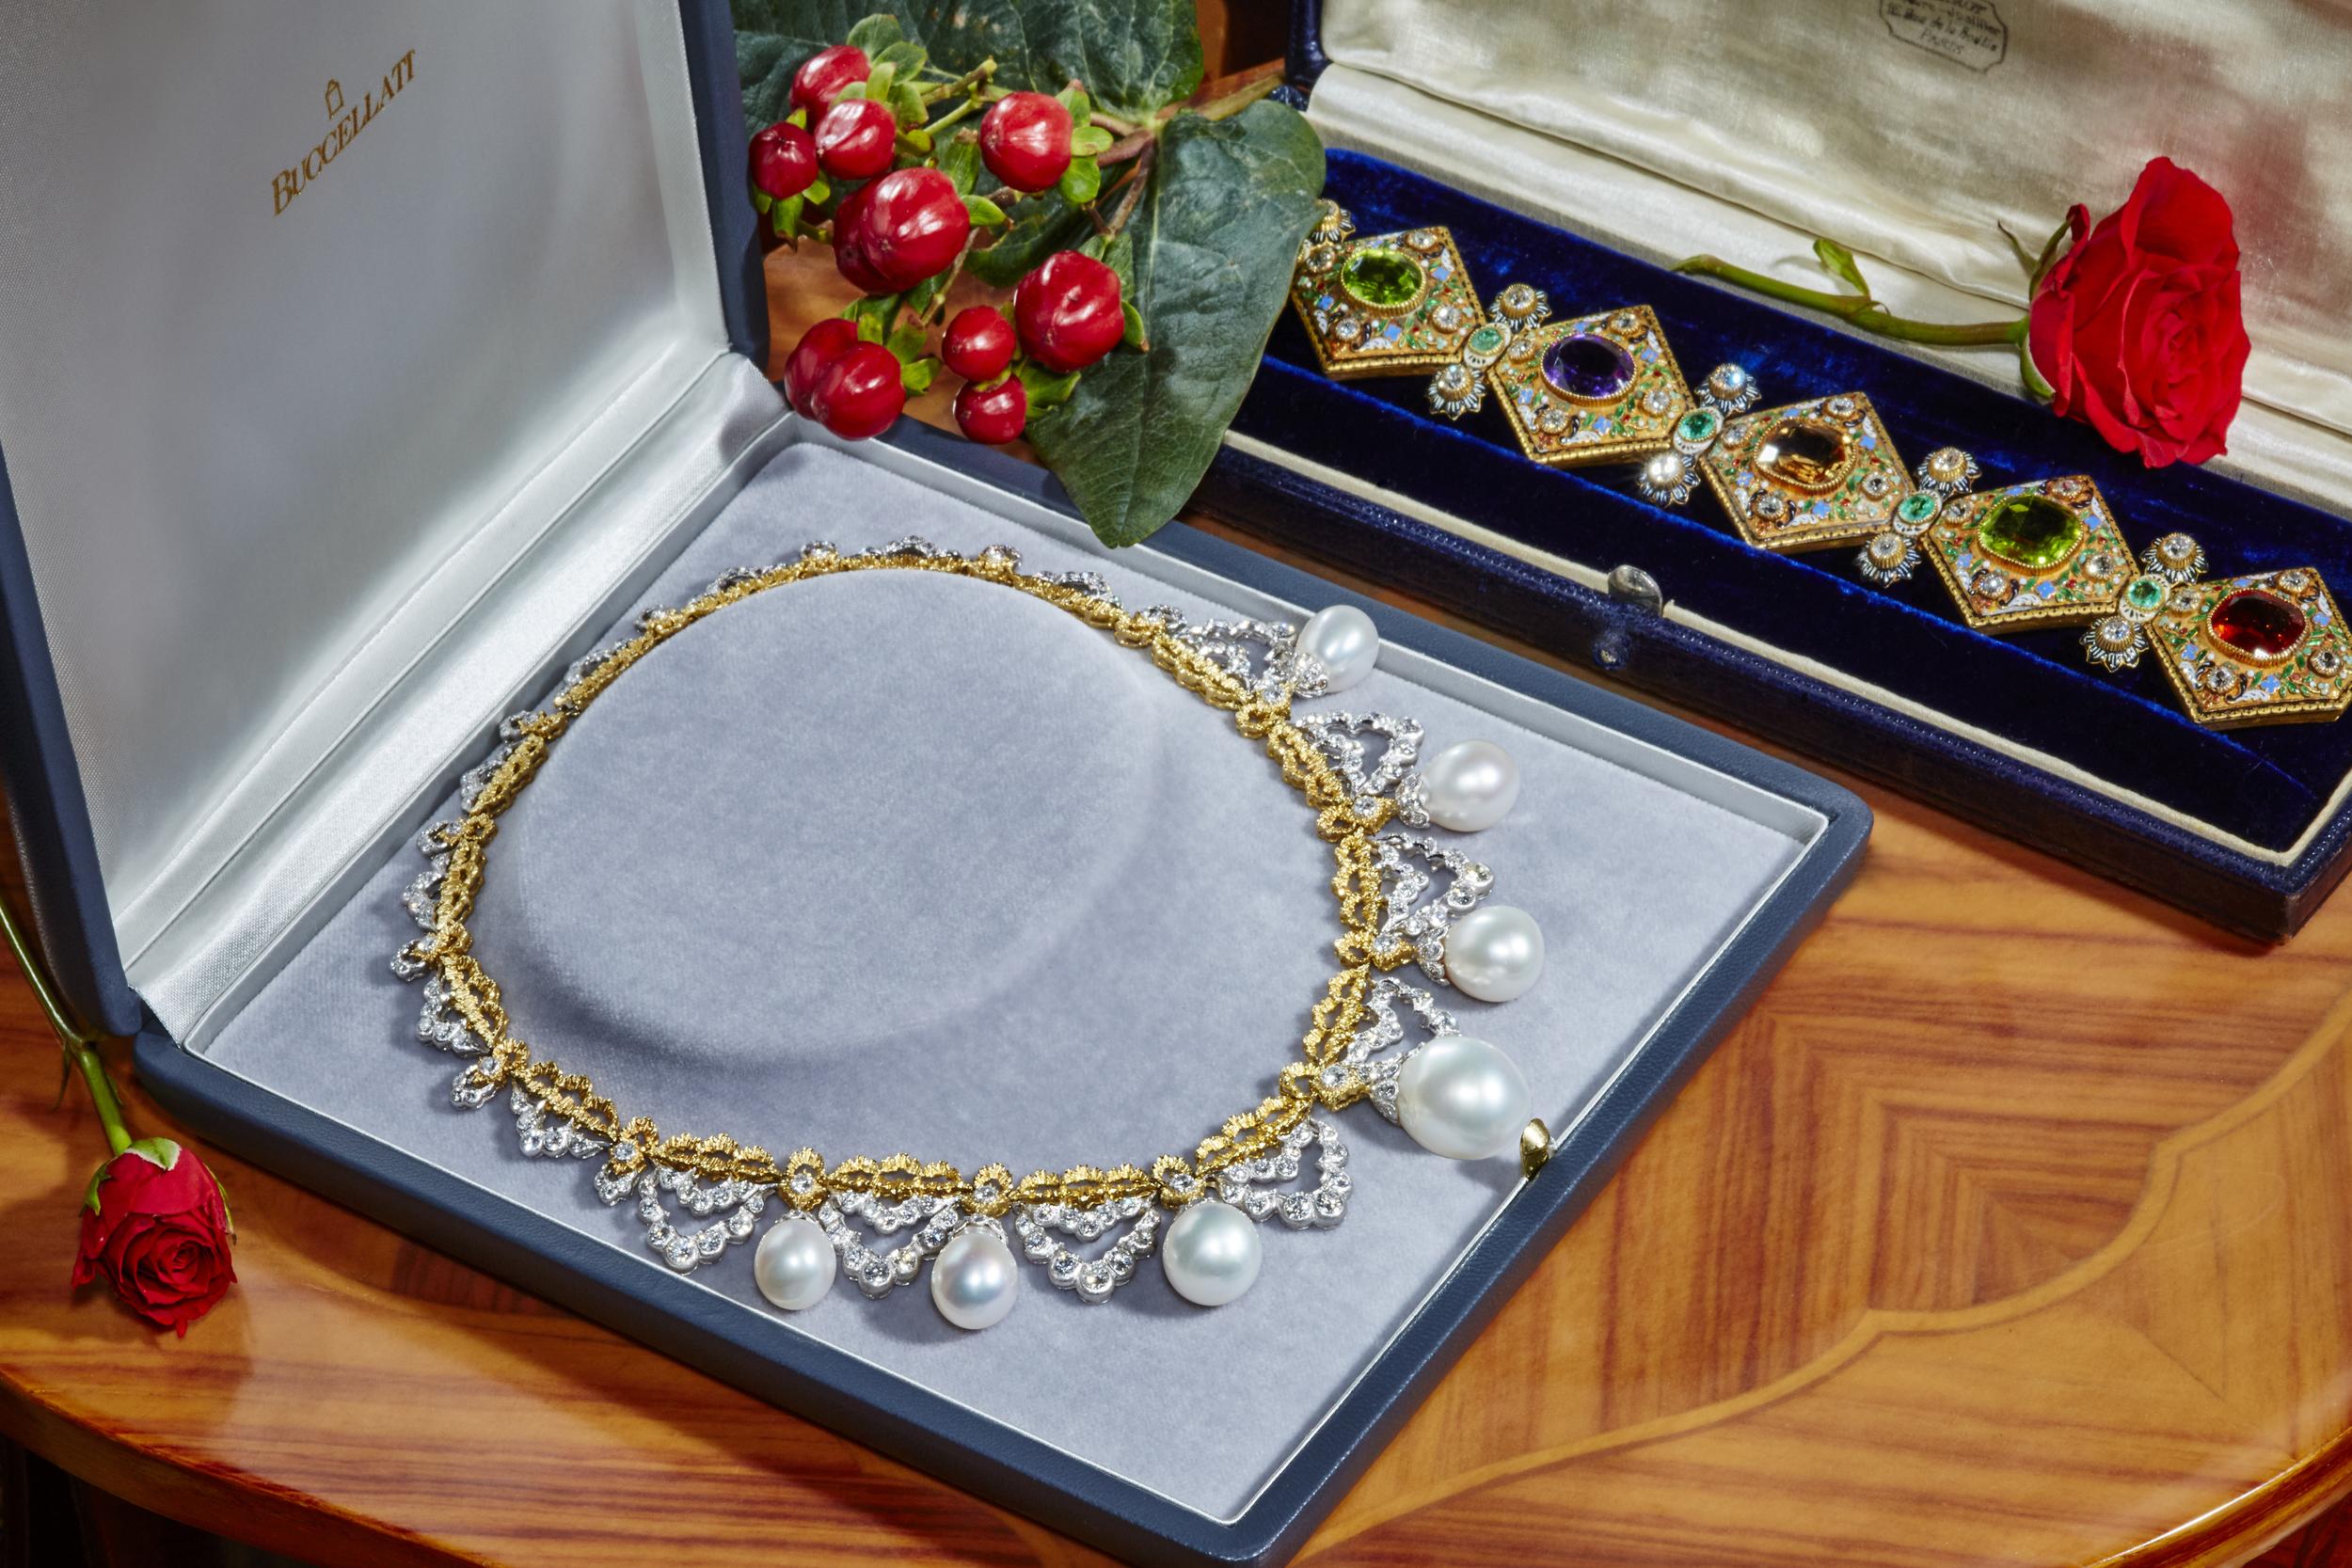 jewelry_02_a_19235.jpg